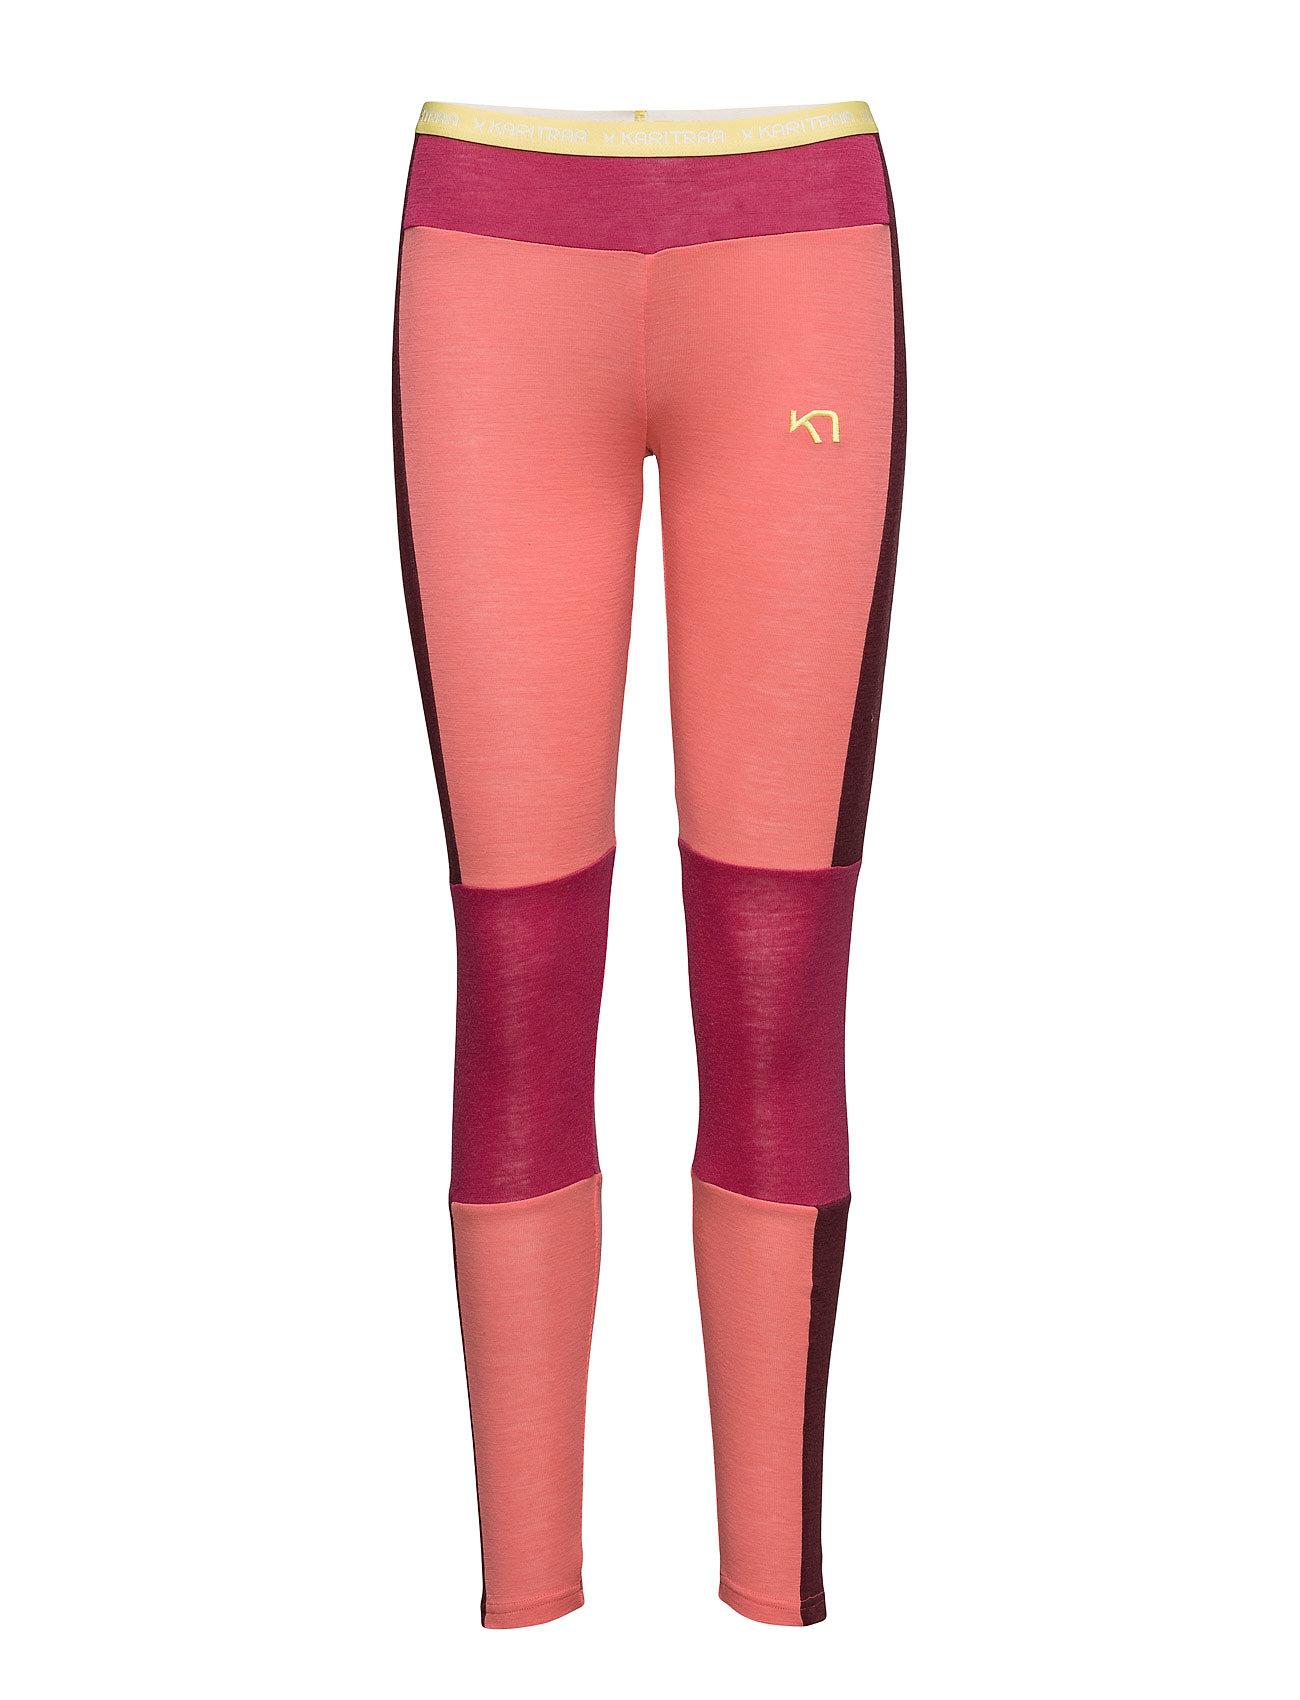 Vossa Pant Kari Traa Sportstøj til Kvinder i